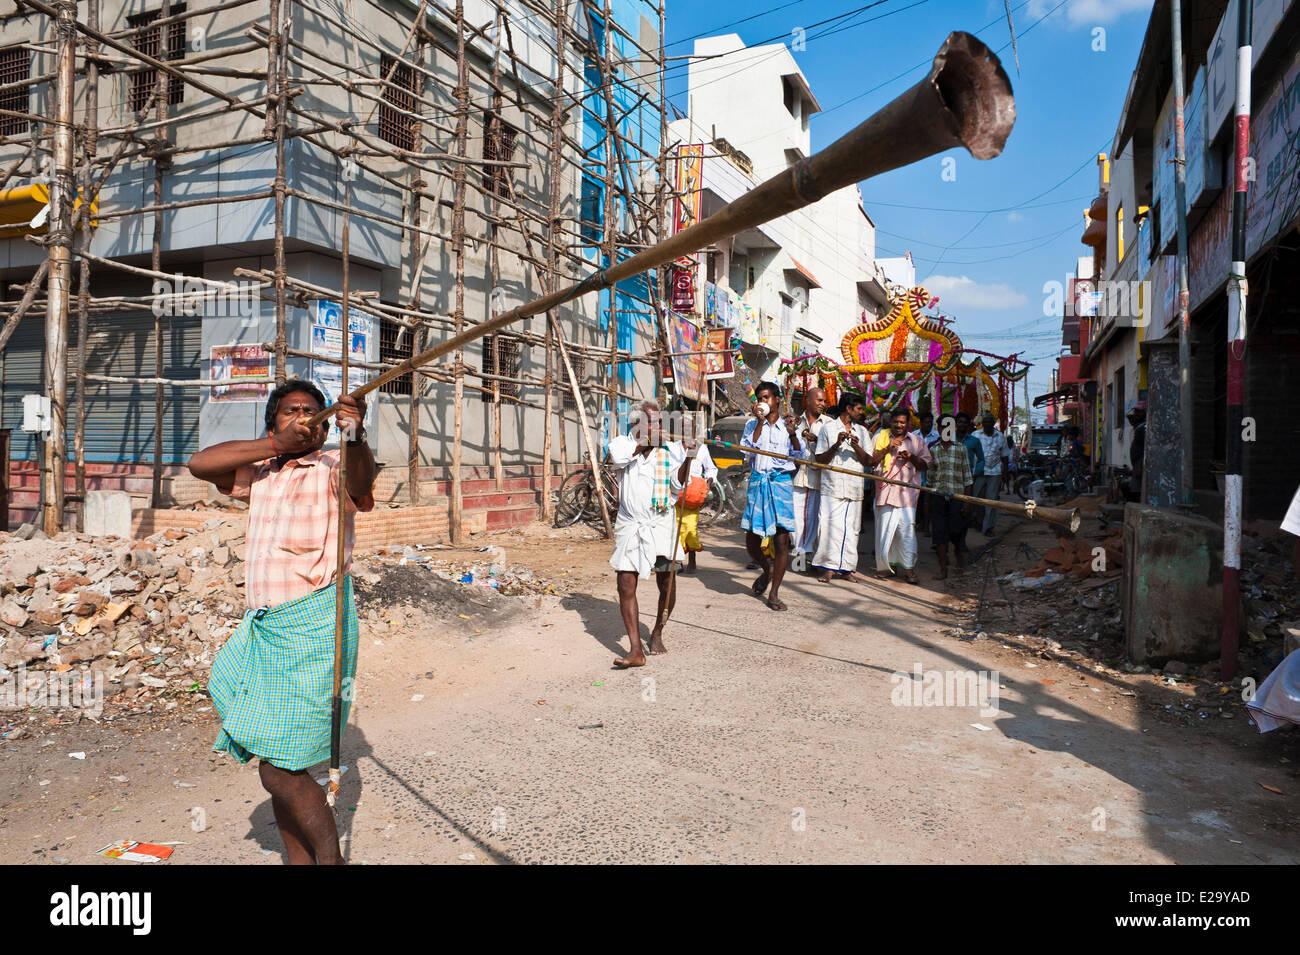 India, Tamil Nadu State, Kanchipuram, funeral procession - Stock Image